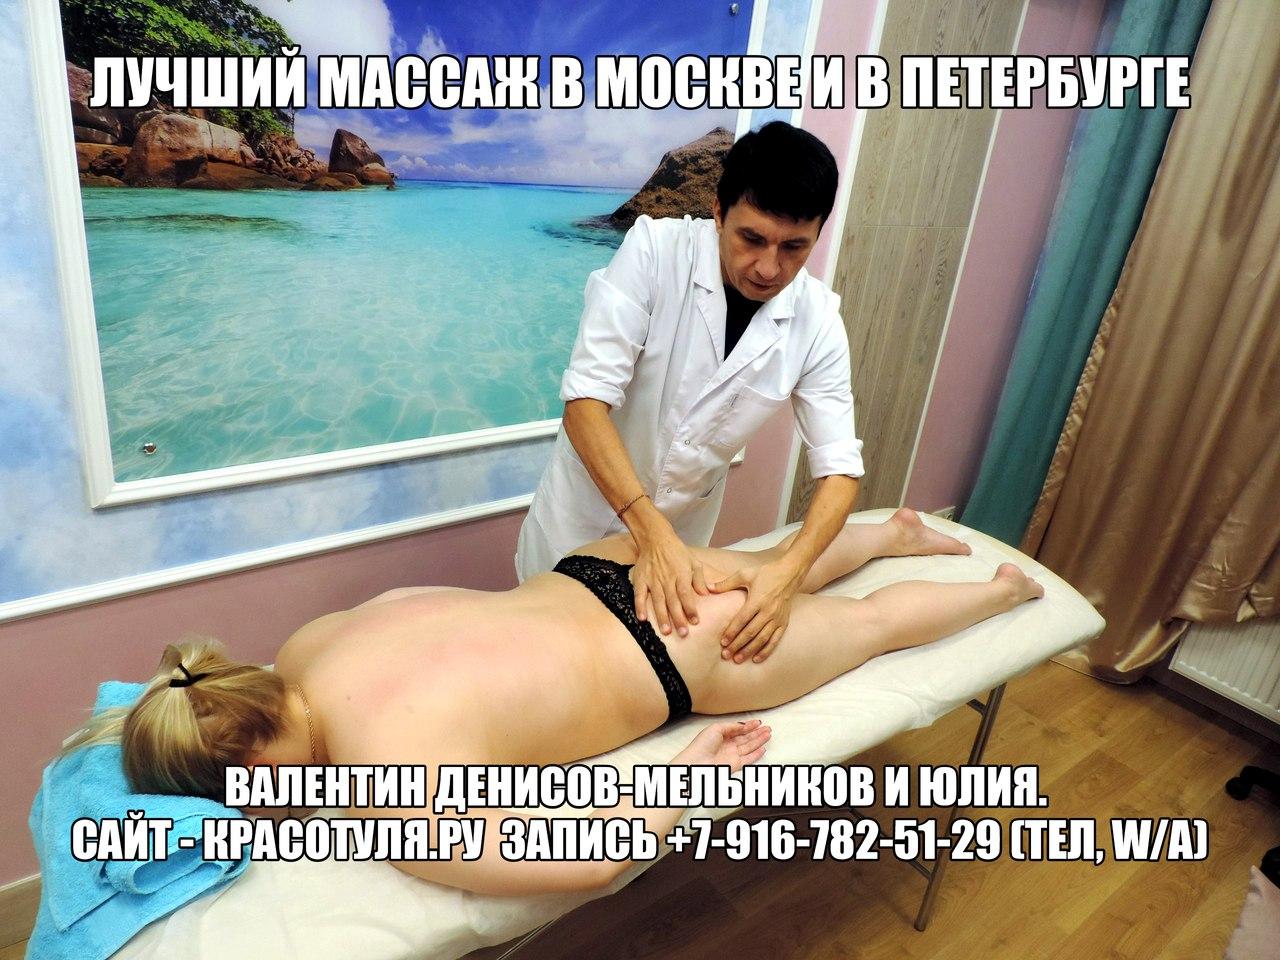 u-muzhika-vstaet-chlen-vo-vremya-massazha